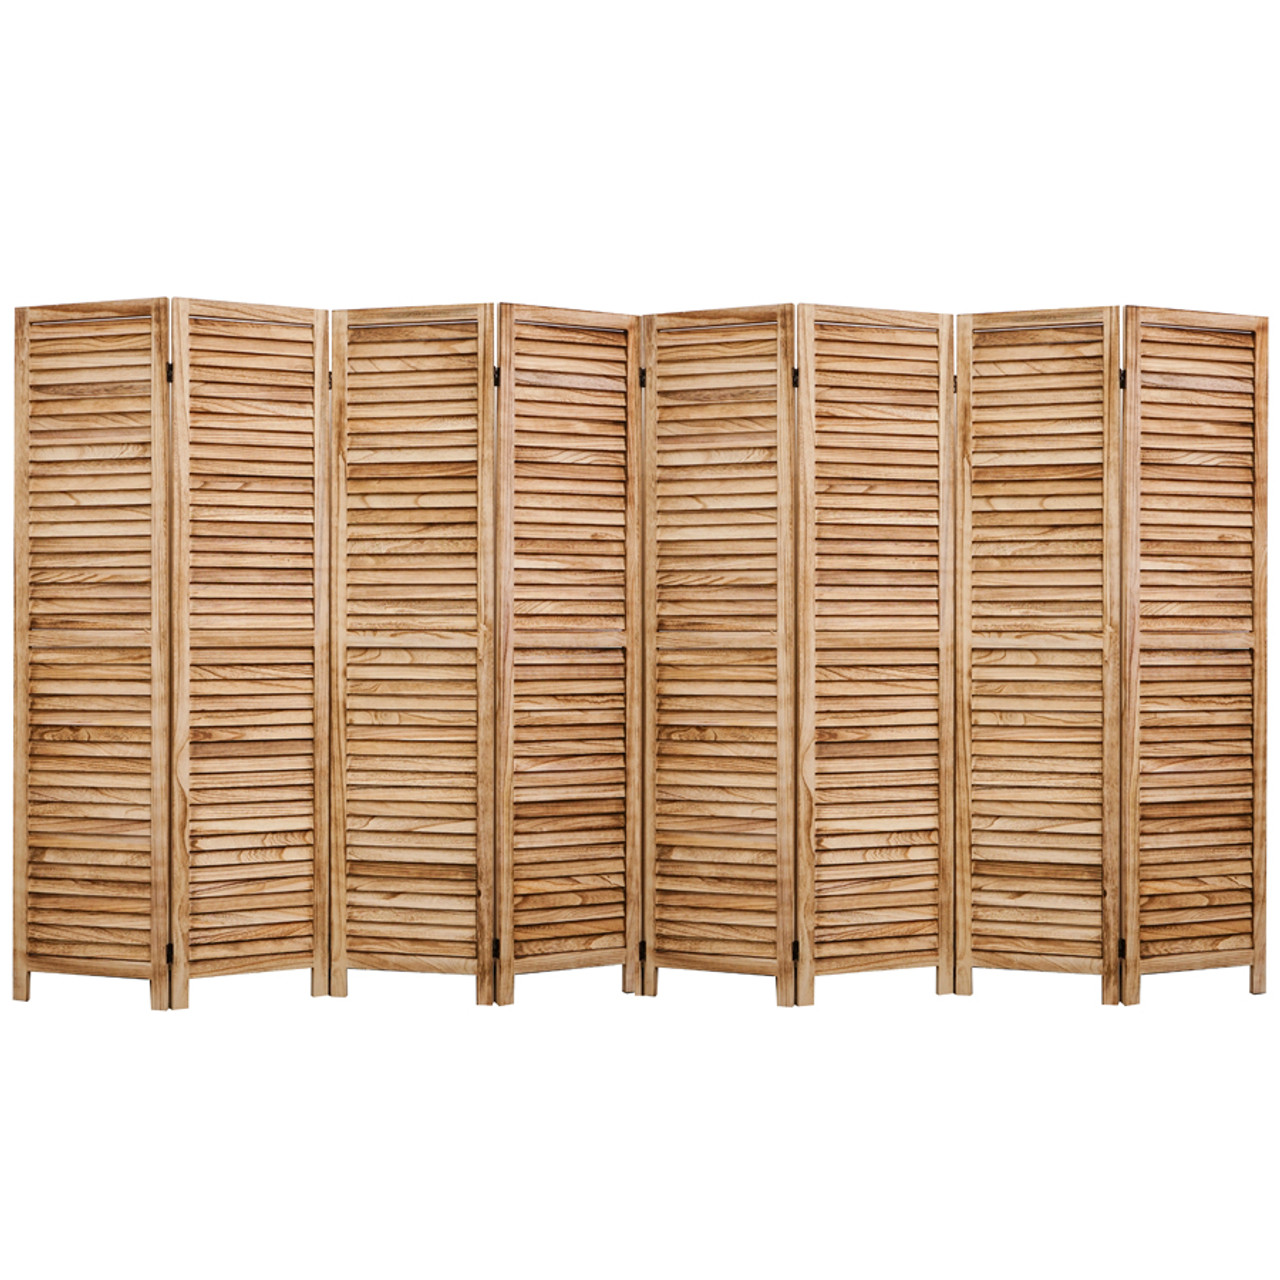 4, 6, 8 Panel Room Divider Full Length Wood Shutters Natural in USA, California, New York, NY City, Los Angeles, San Francisco, Pennsylvania, Washington DC, Virginia, Maryland